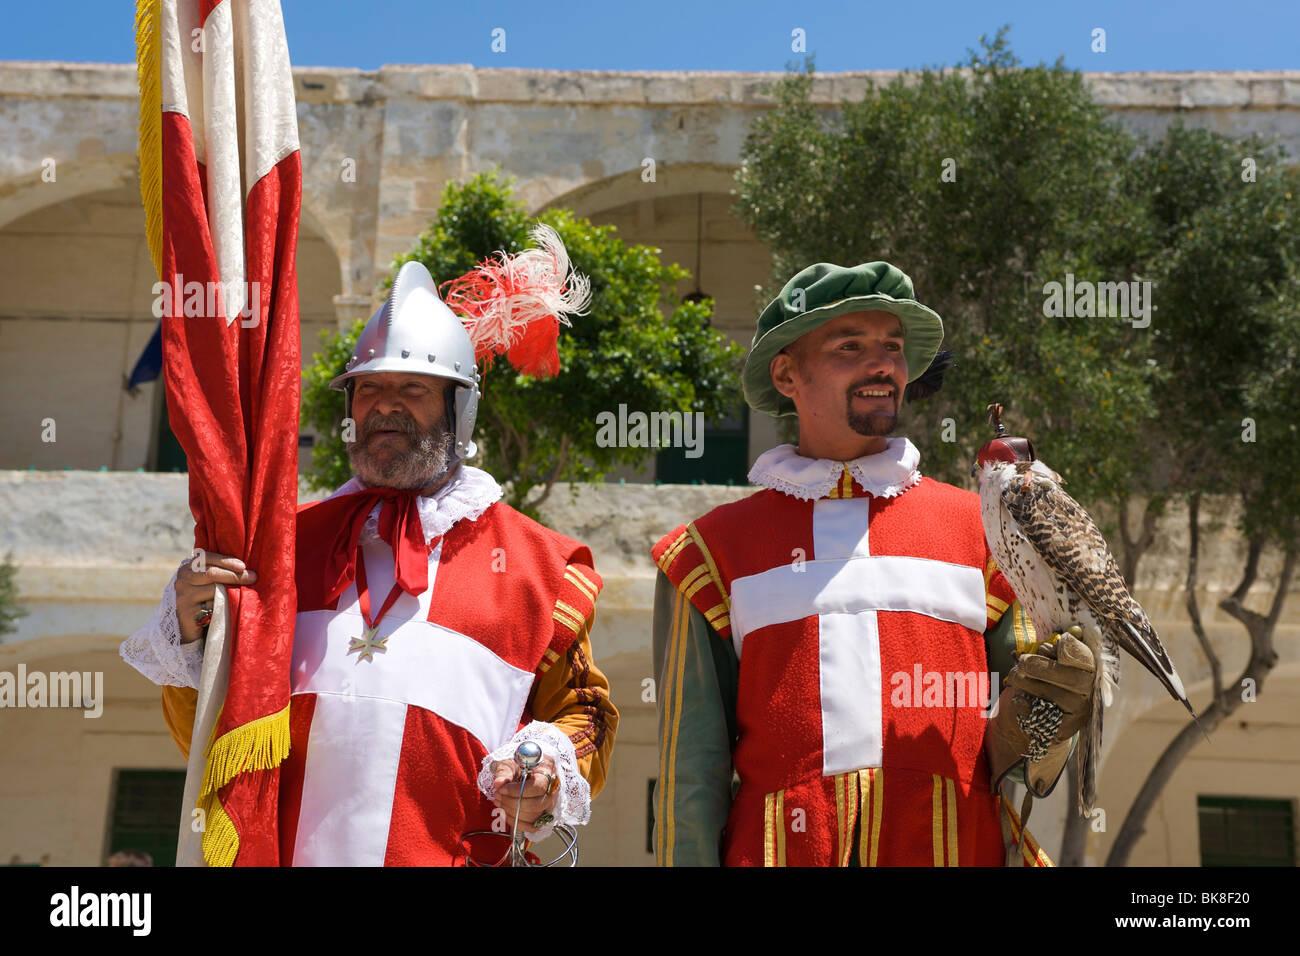 In Guardia Parade at Fort St Elmo, Valletta, Malta, Europe - Stock Image